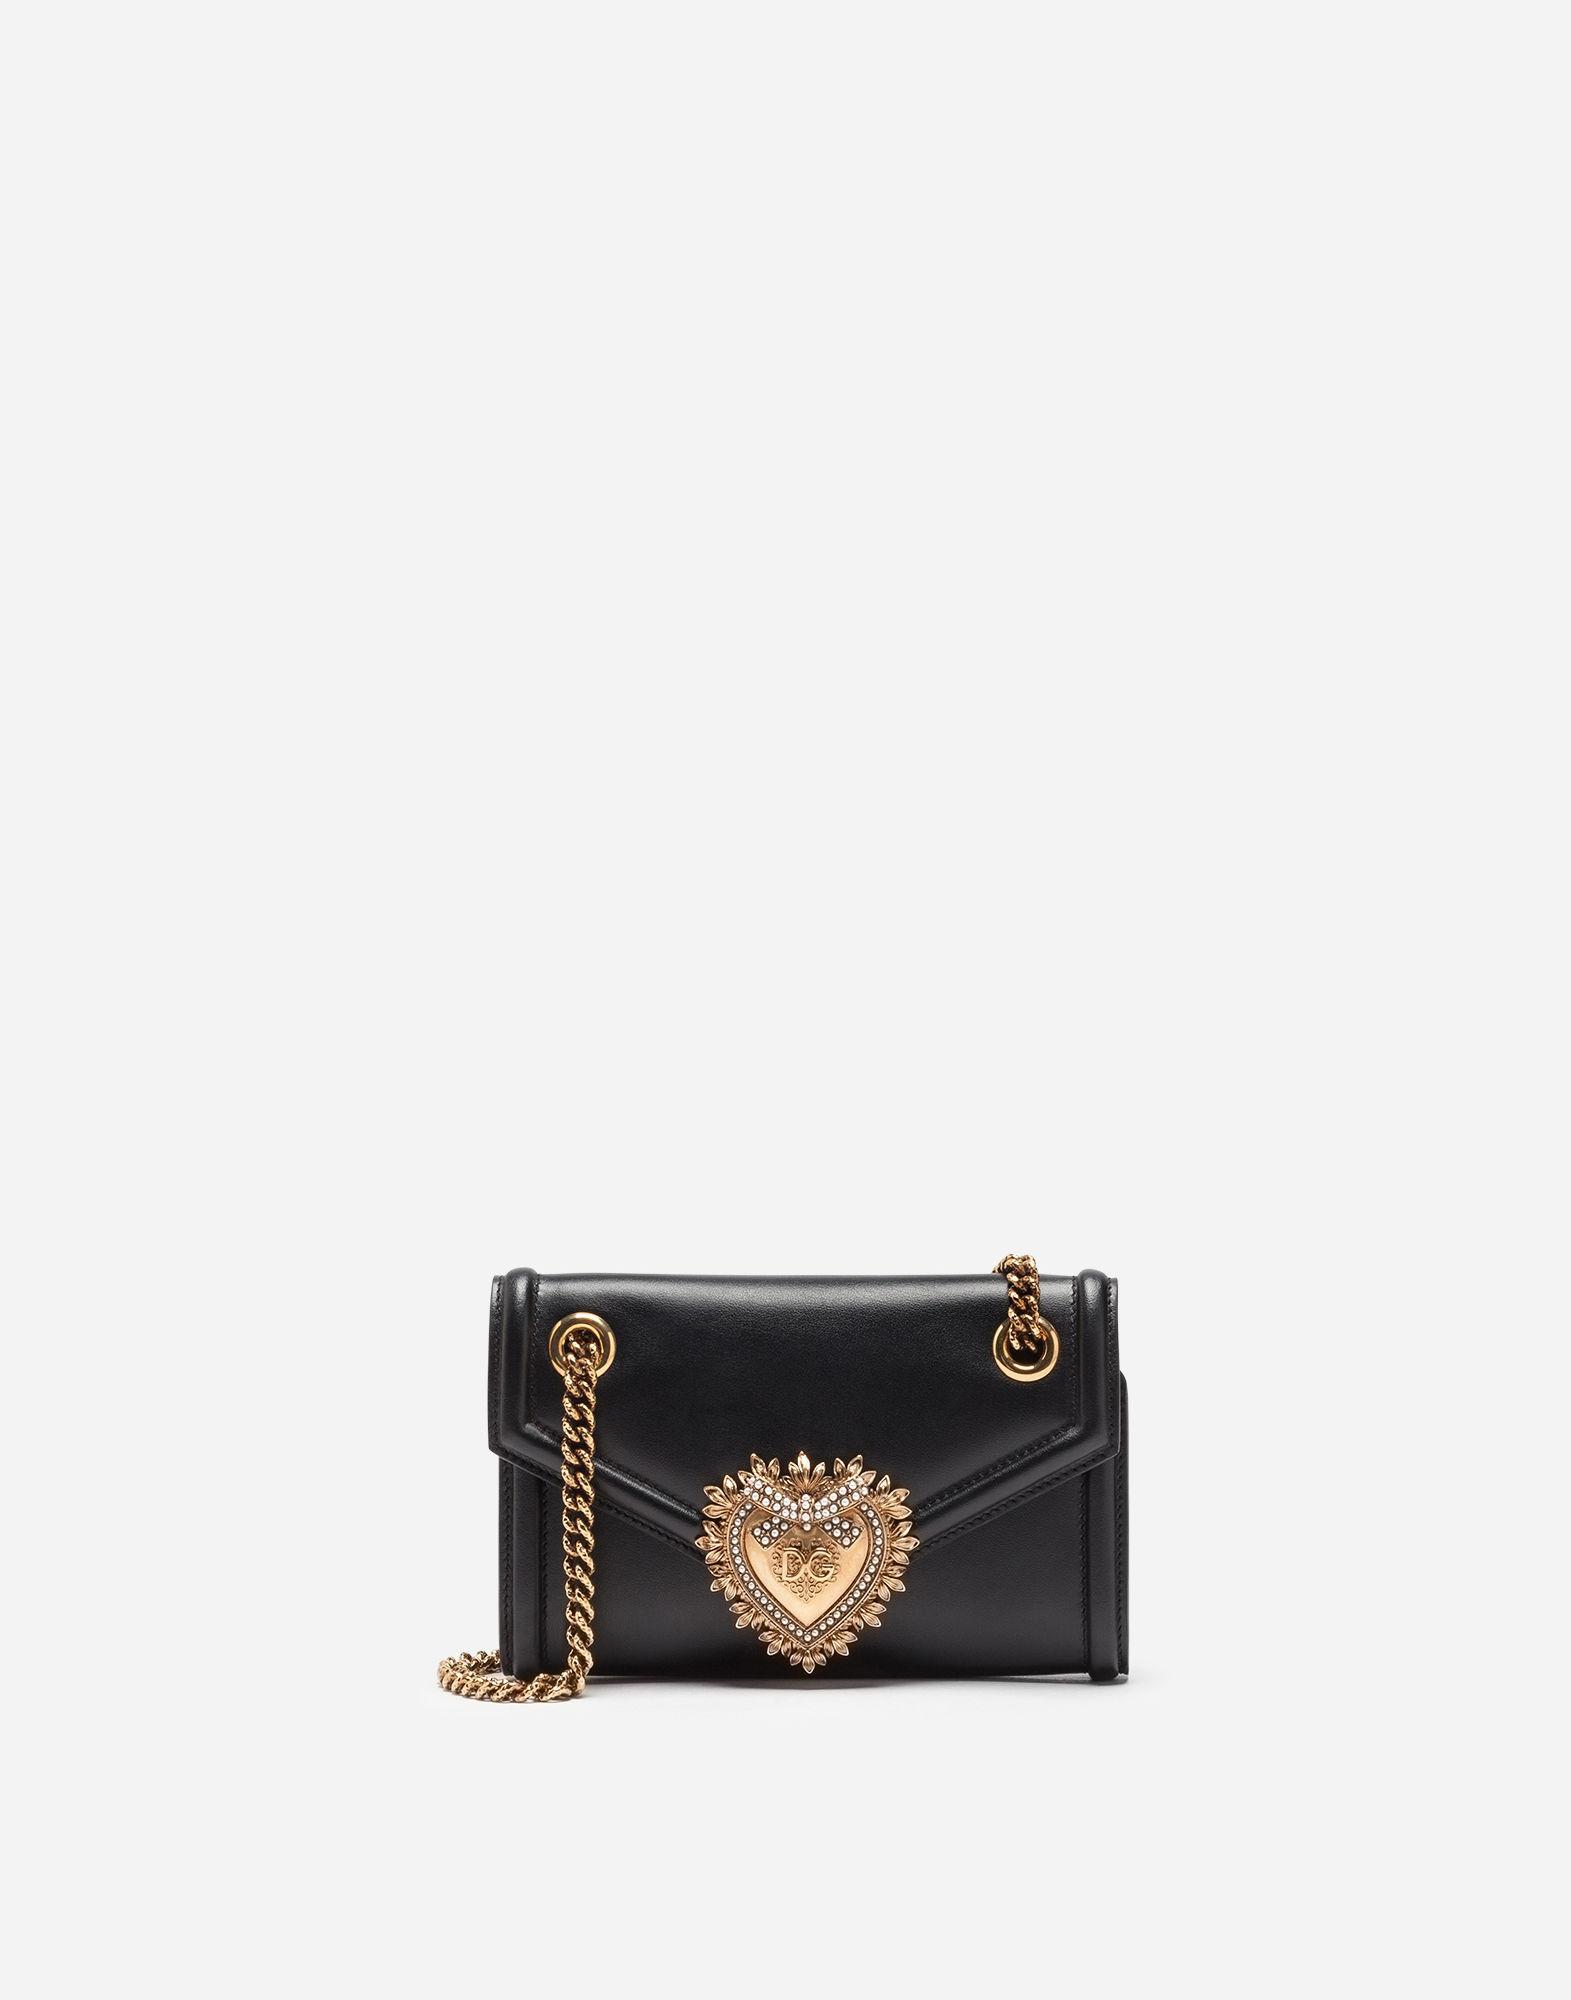 55eead37609c Lyst - Dolce   Gabbana Medium Devotion Shoulder Bag in Black - Save 23%